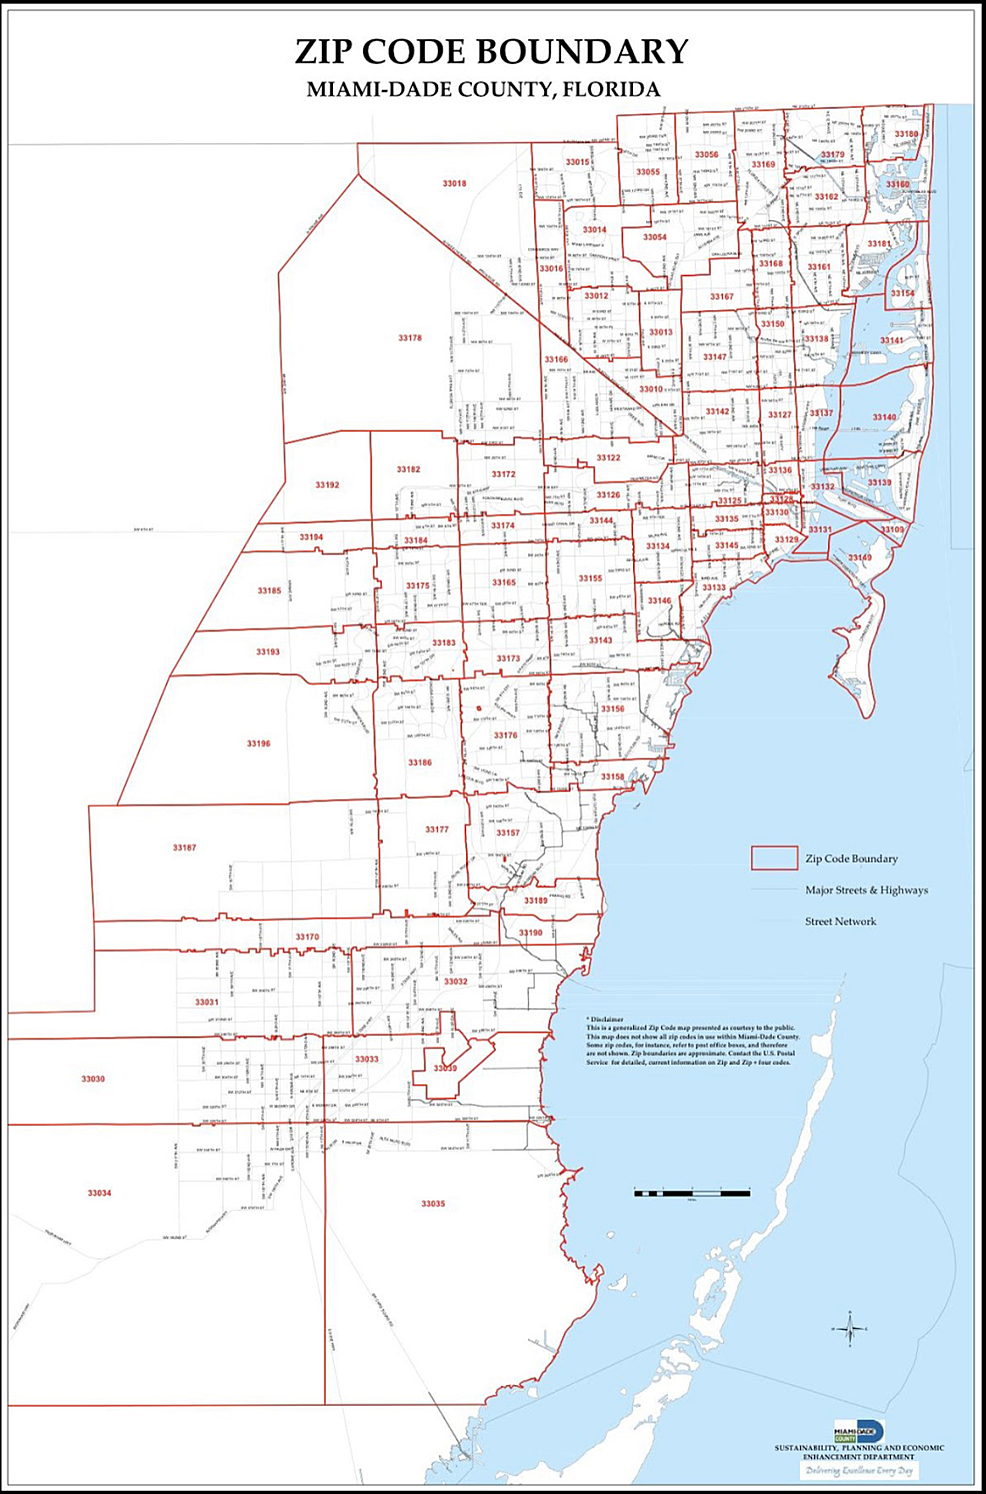 ZIP-Code-Boundary-of-Miami-Dade-County